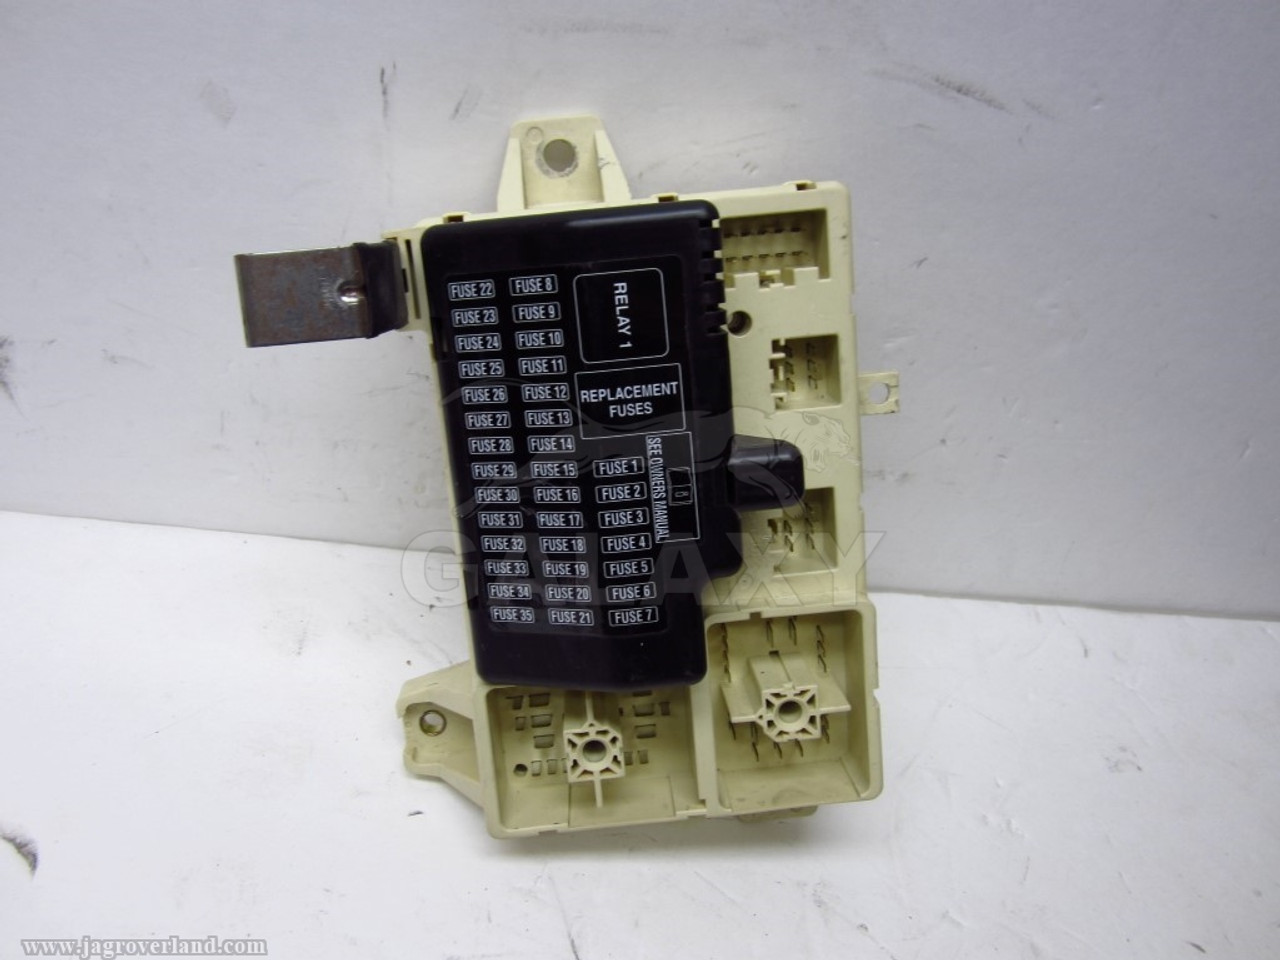 s type fuse box 00 02 s type fuse box xr8t 14a067 ba galaxy jaguar jaguar s type fuse box layout 00 02 s type fuse box xr8t 14a067 ba